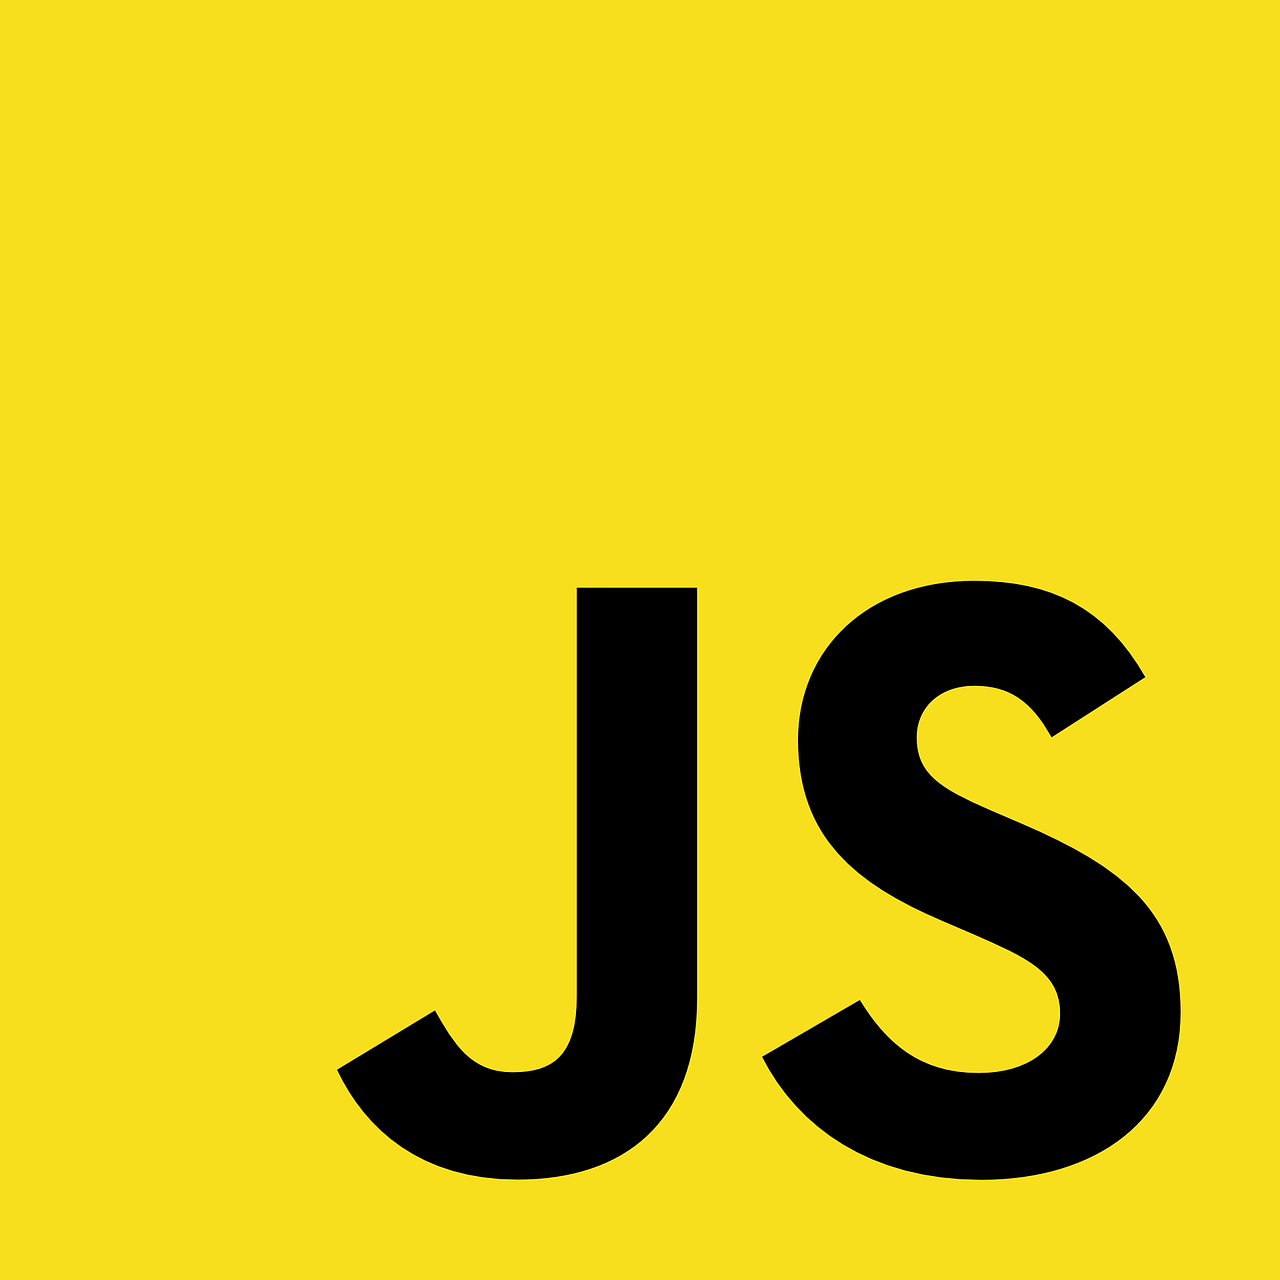 Javascript Js Logo   Kostenlose Vektorgrafik auf Pixabay